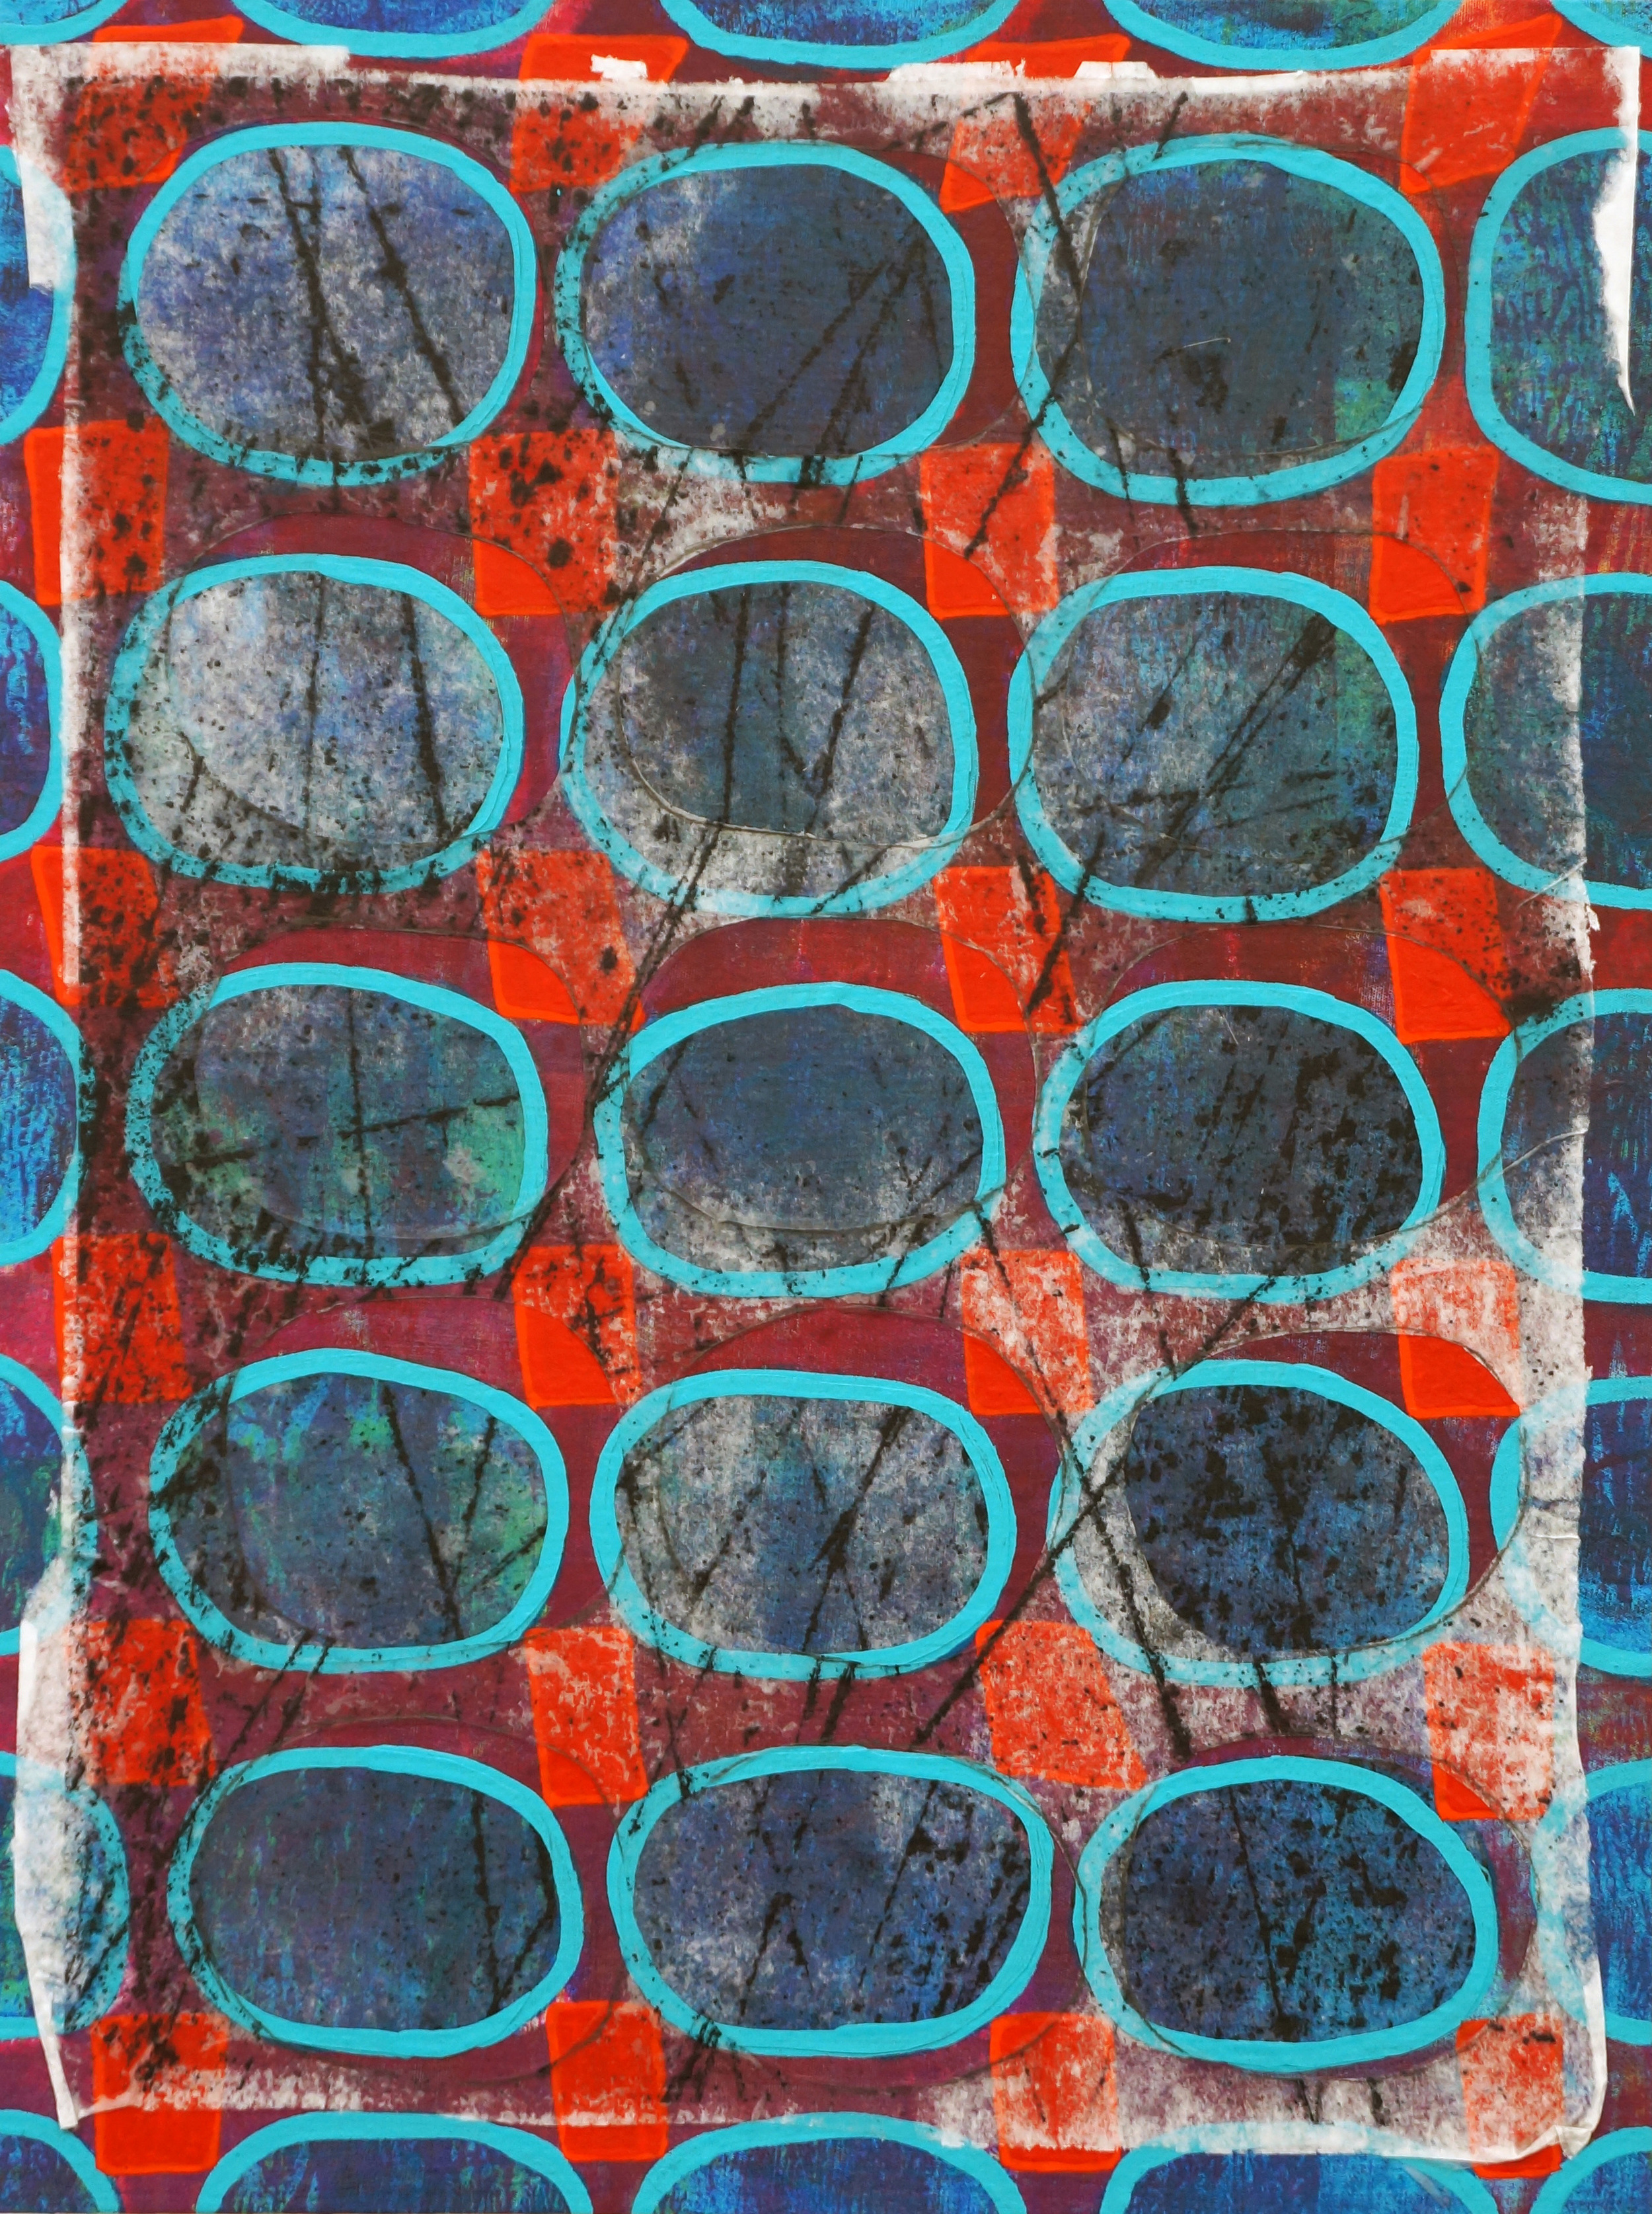 Jeanne Williamson, Skating Marks on Ice on Fences #1 , mixed media on cradled board, 12x9